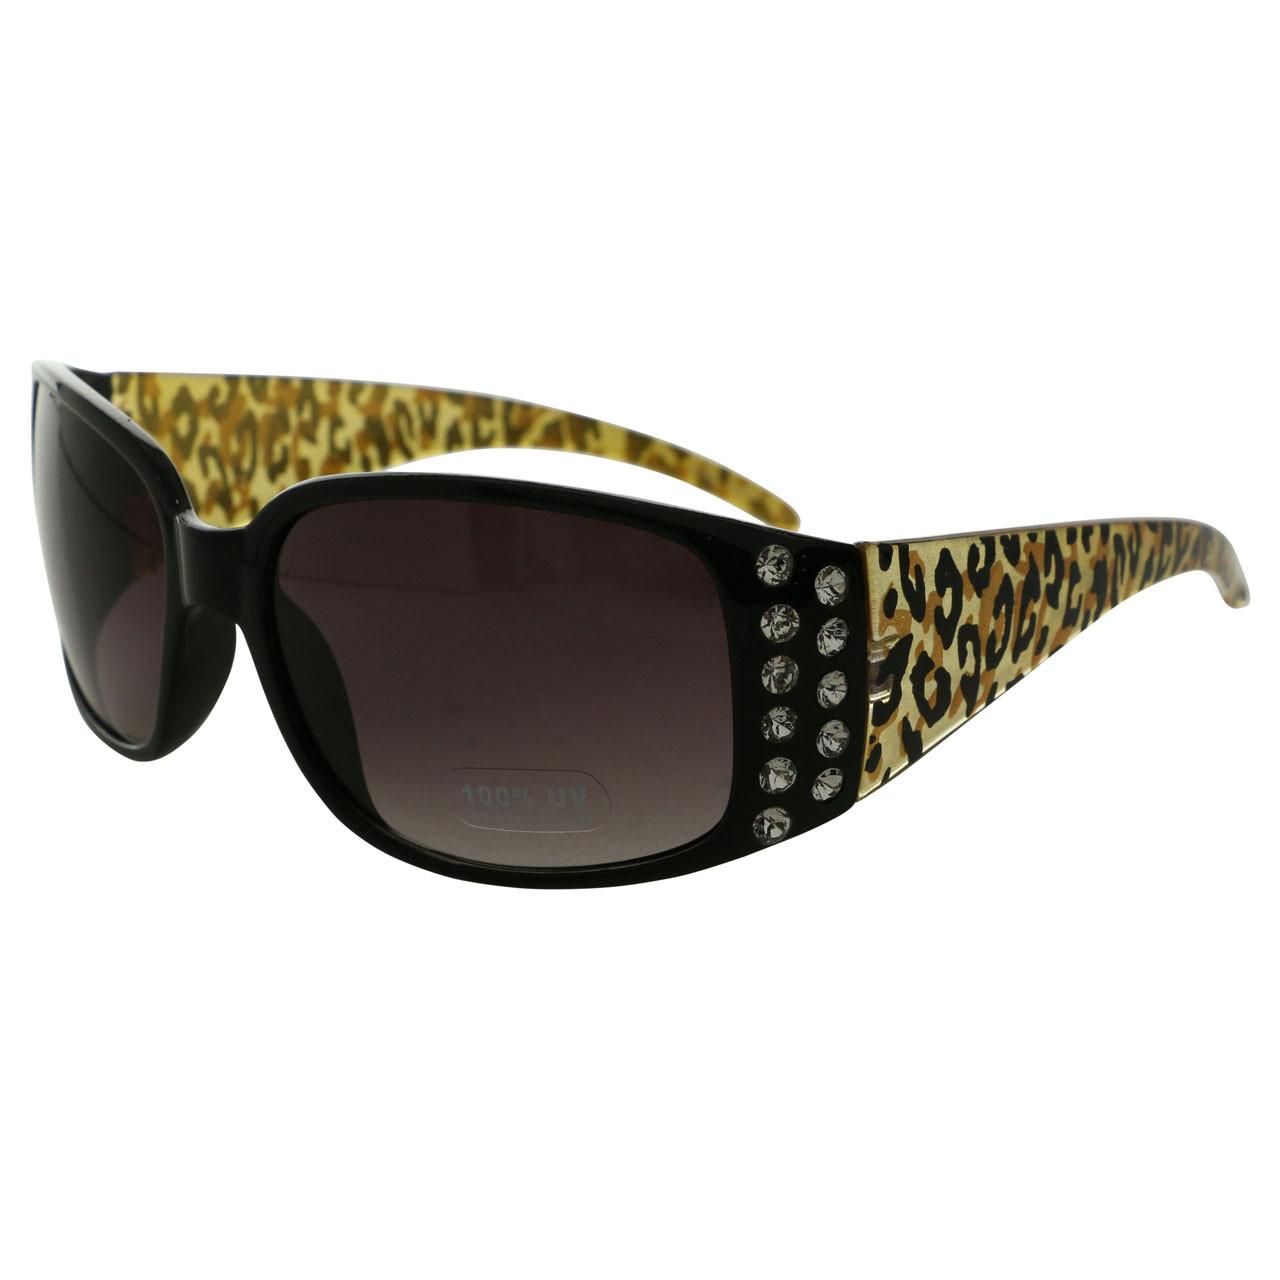 100% UV Protection Cheetah Print Rectangle Sunglasses 26SGCROWN